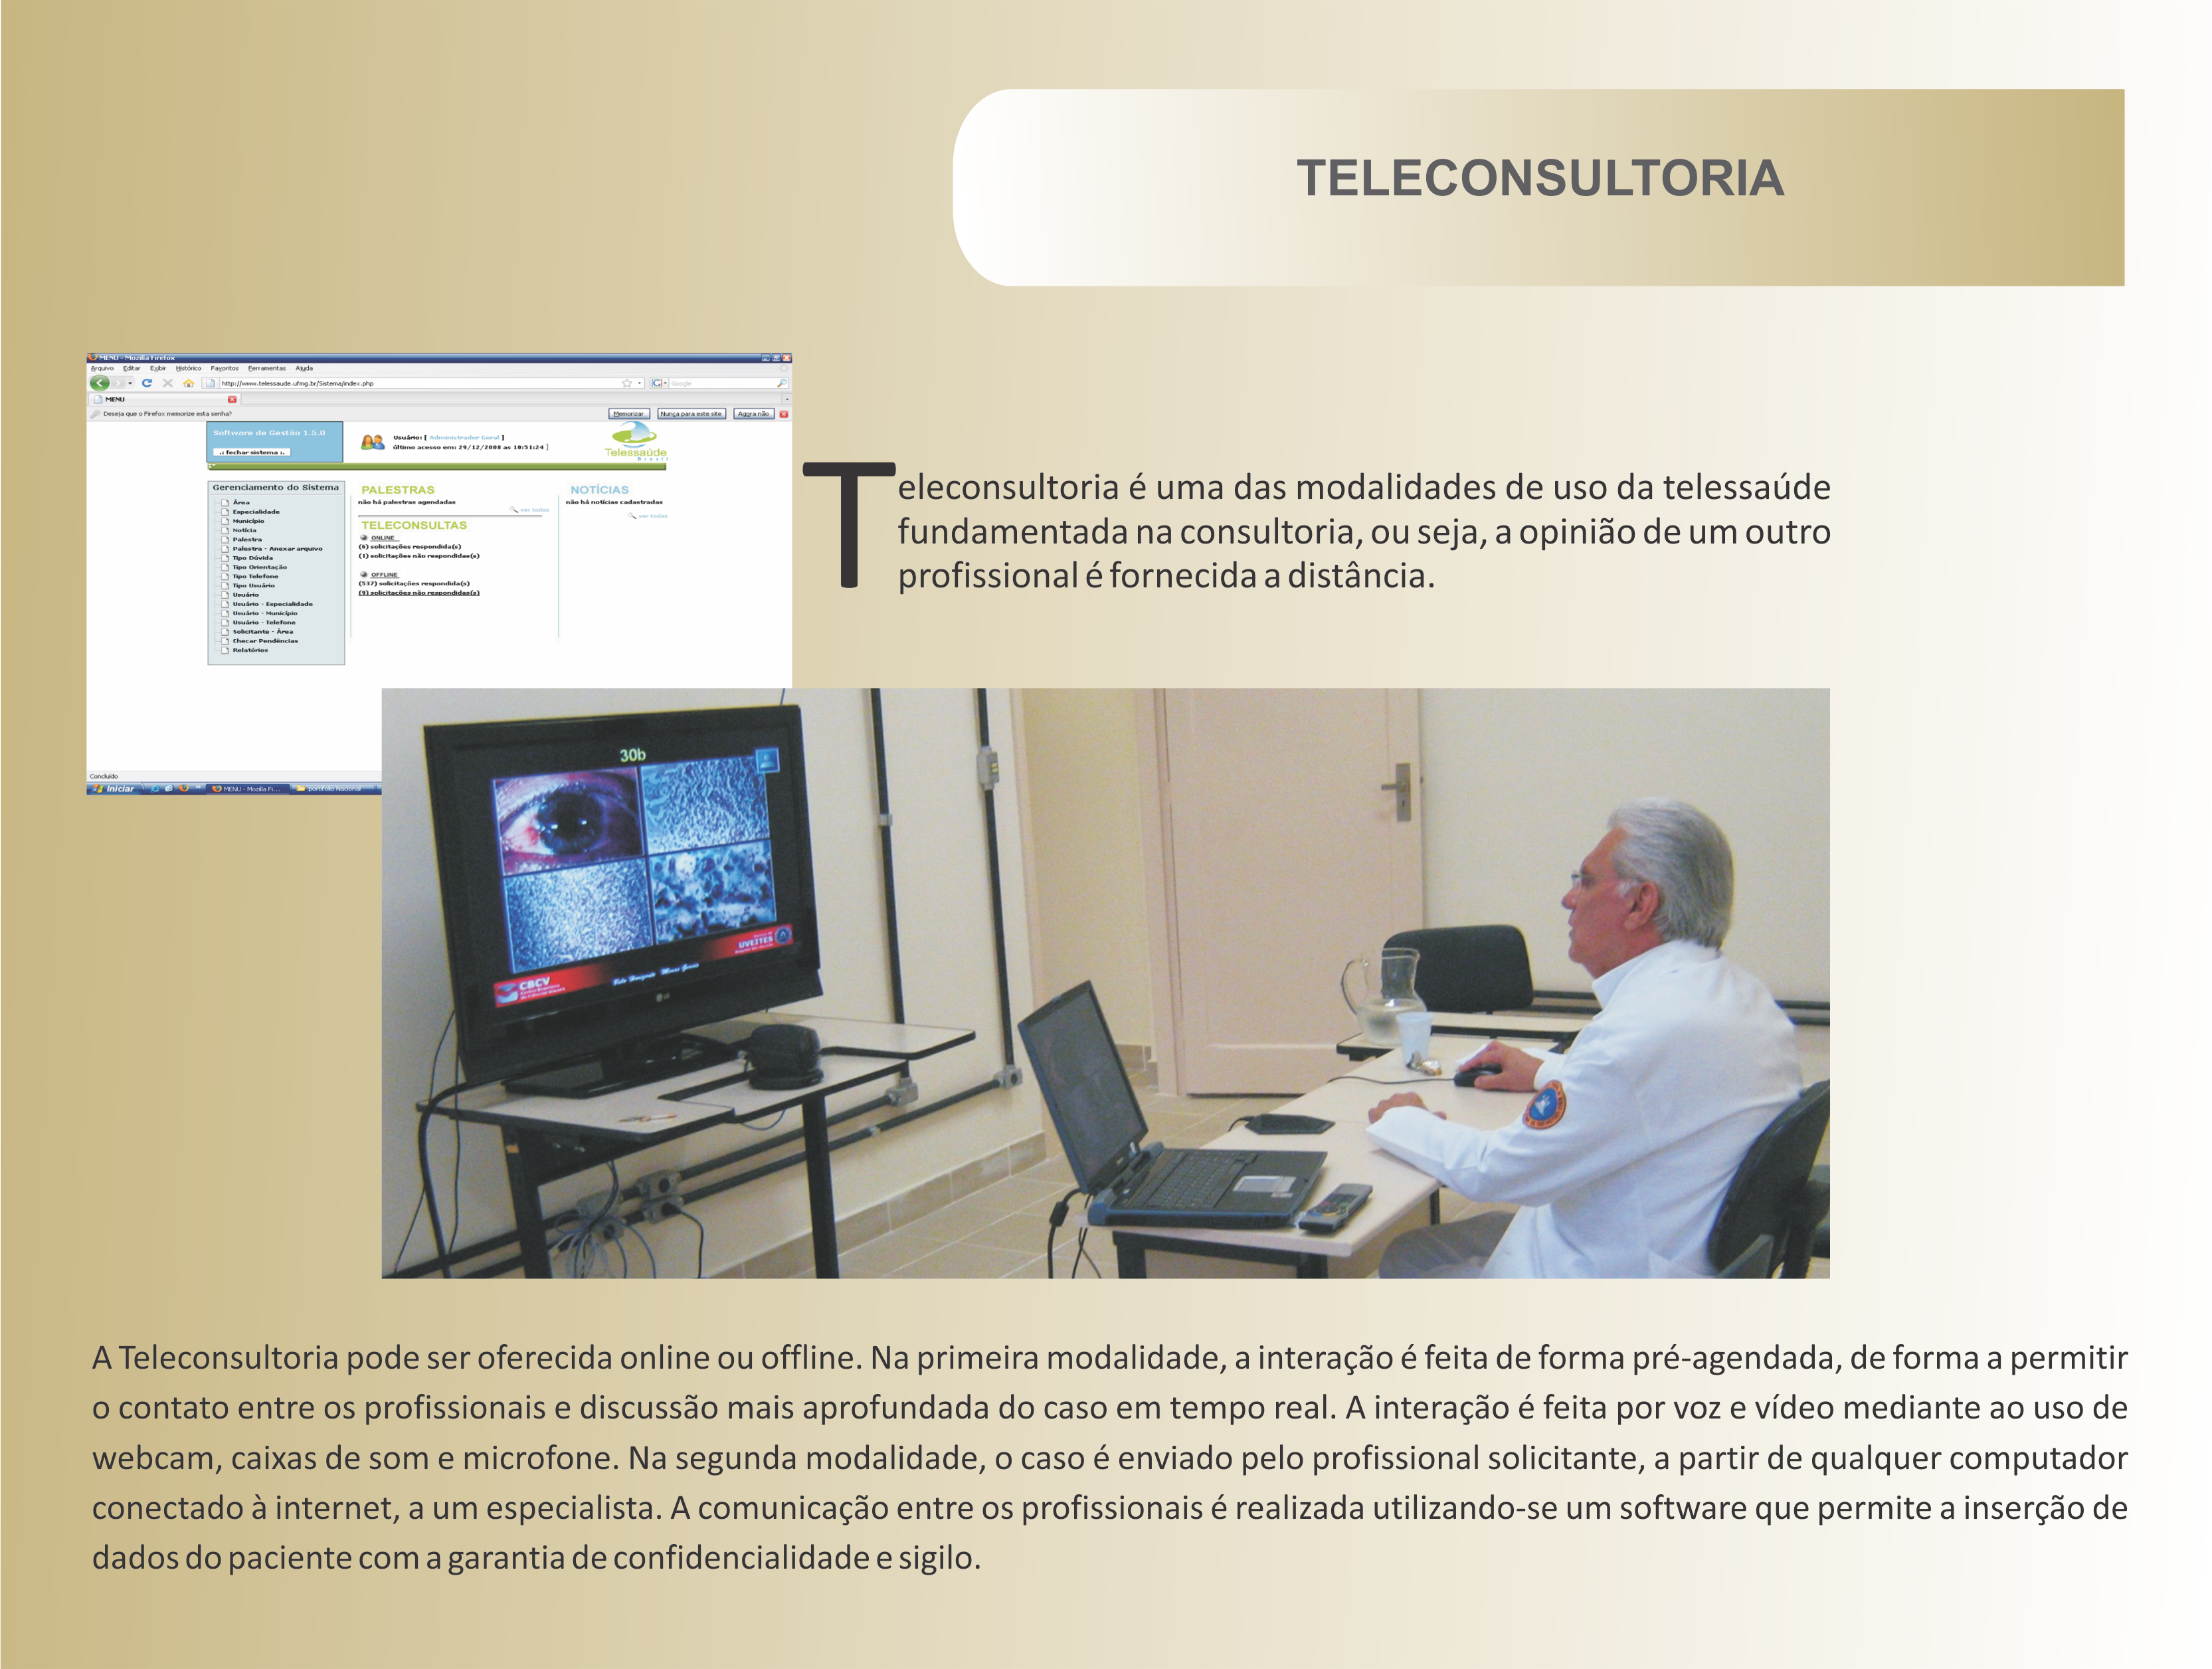 teleconsultoria